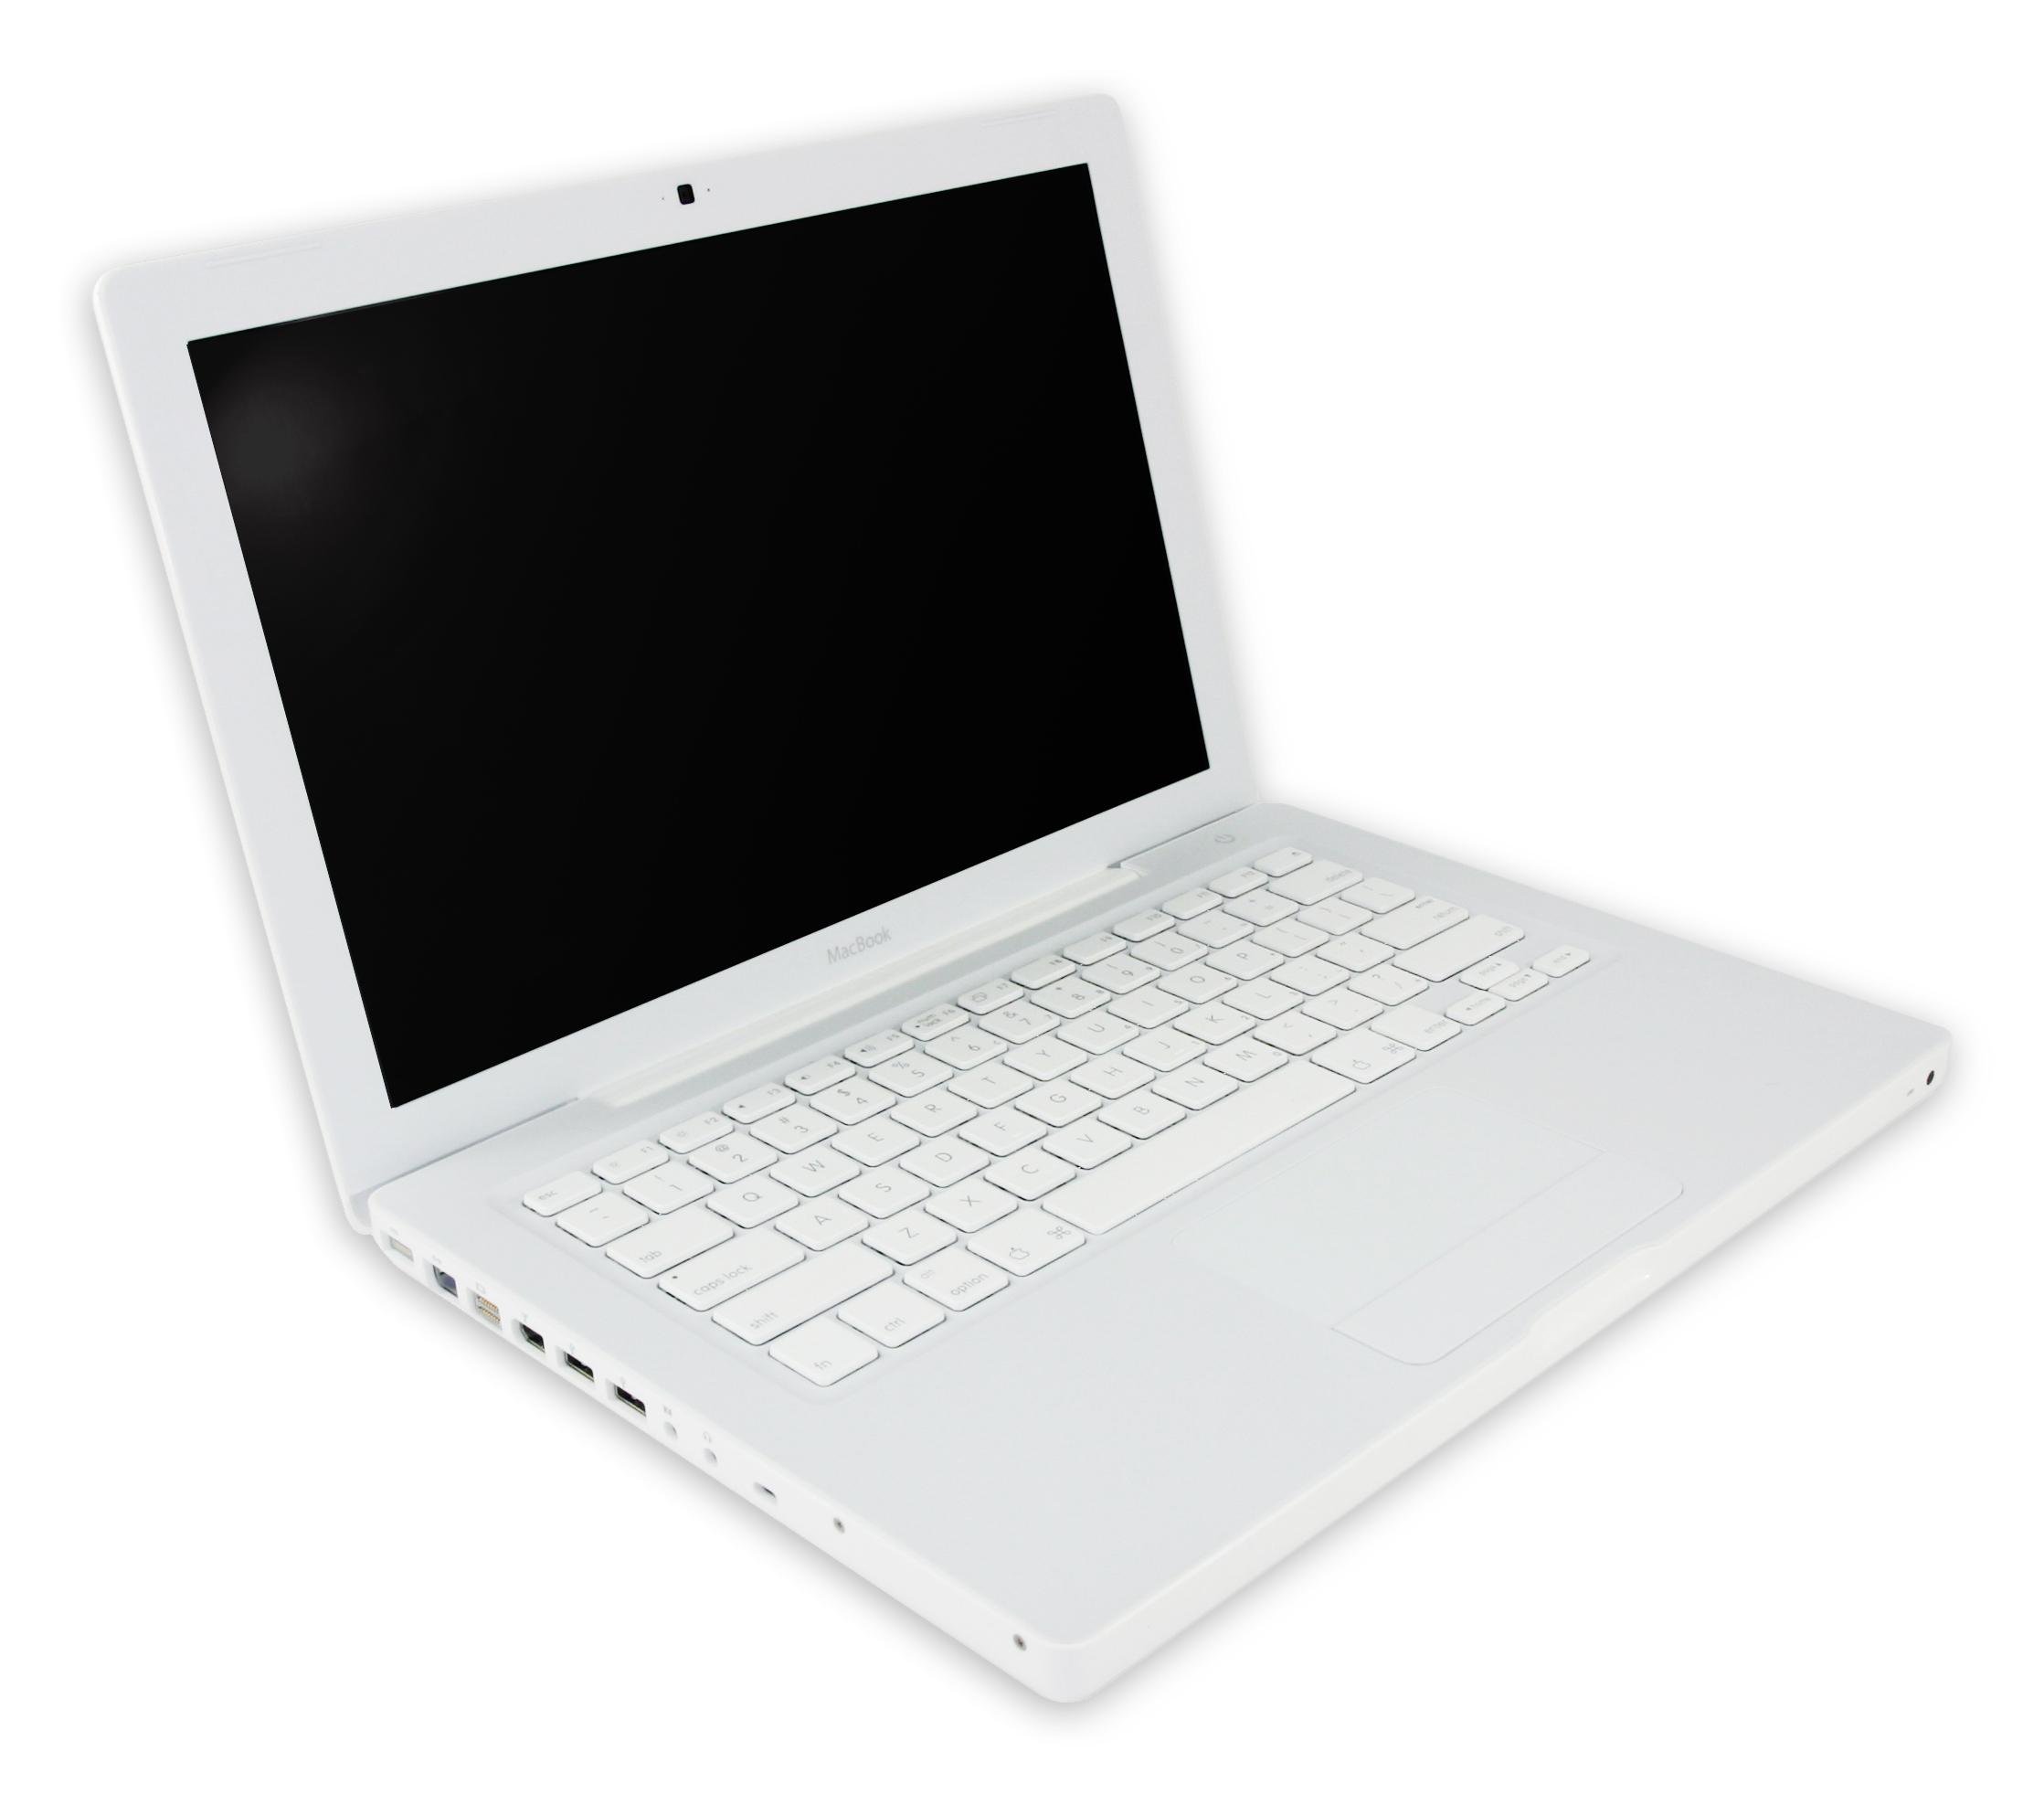 File:Macbook white redjar 20060603.jpg - Wikimedia Commons